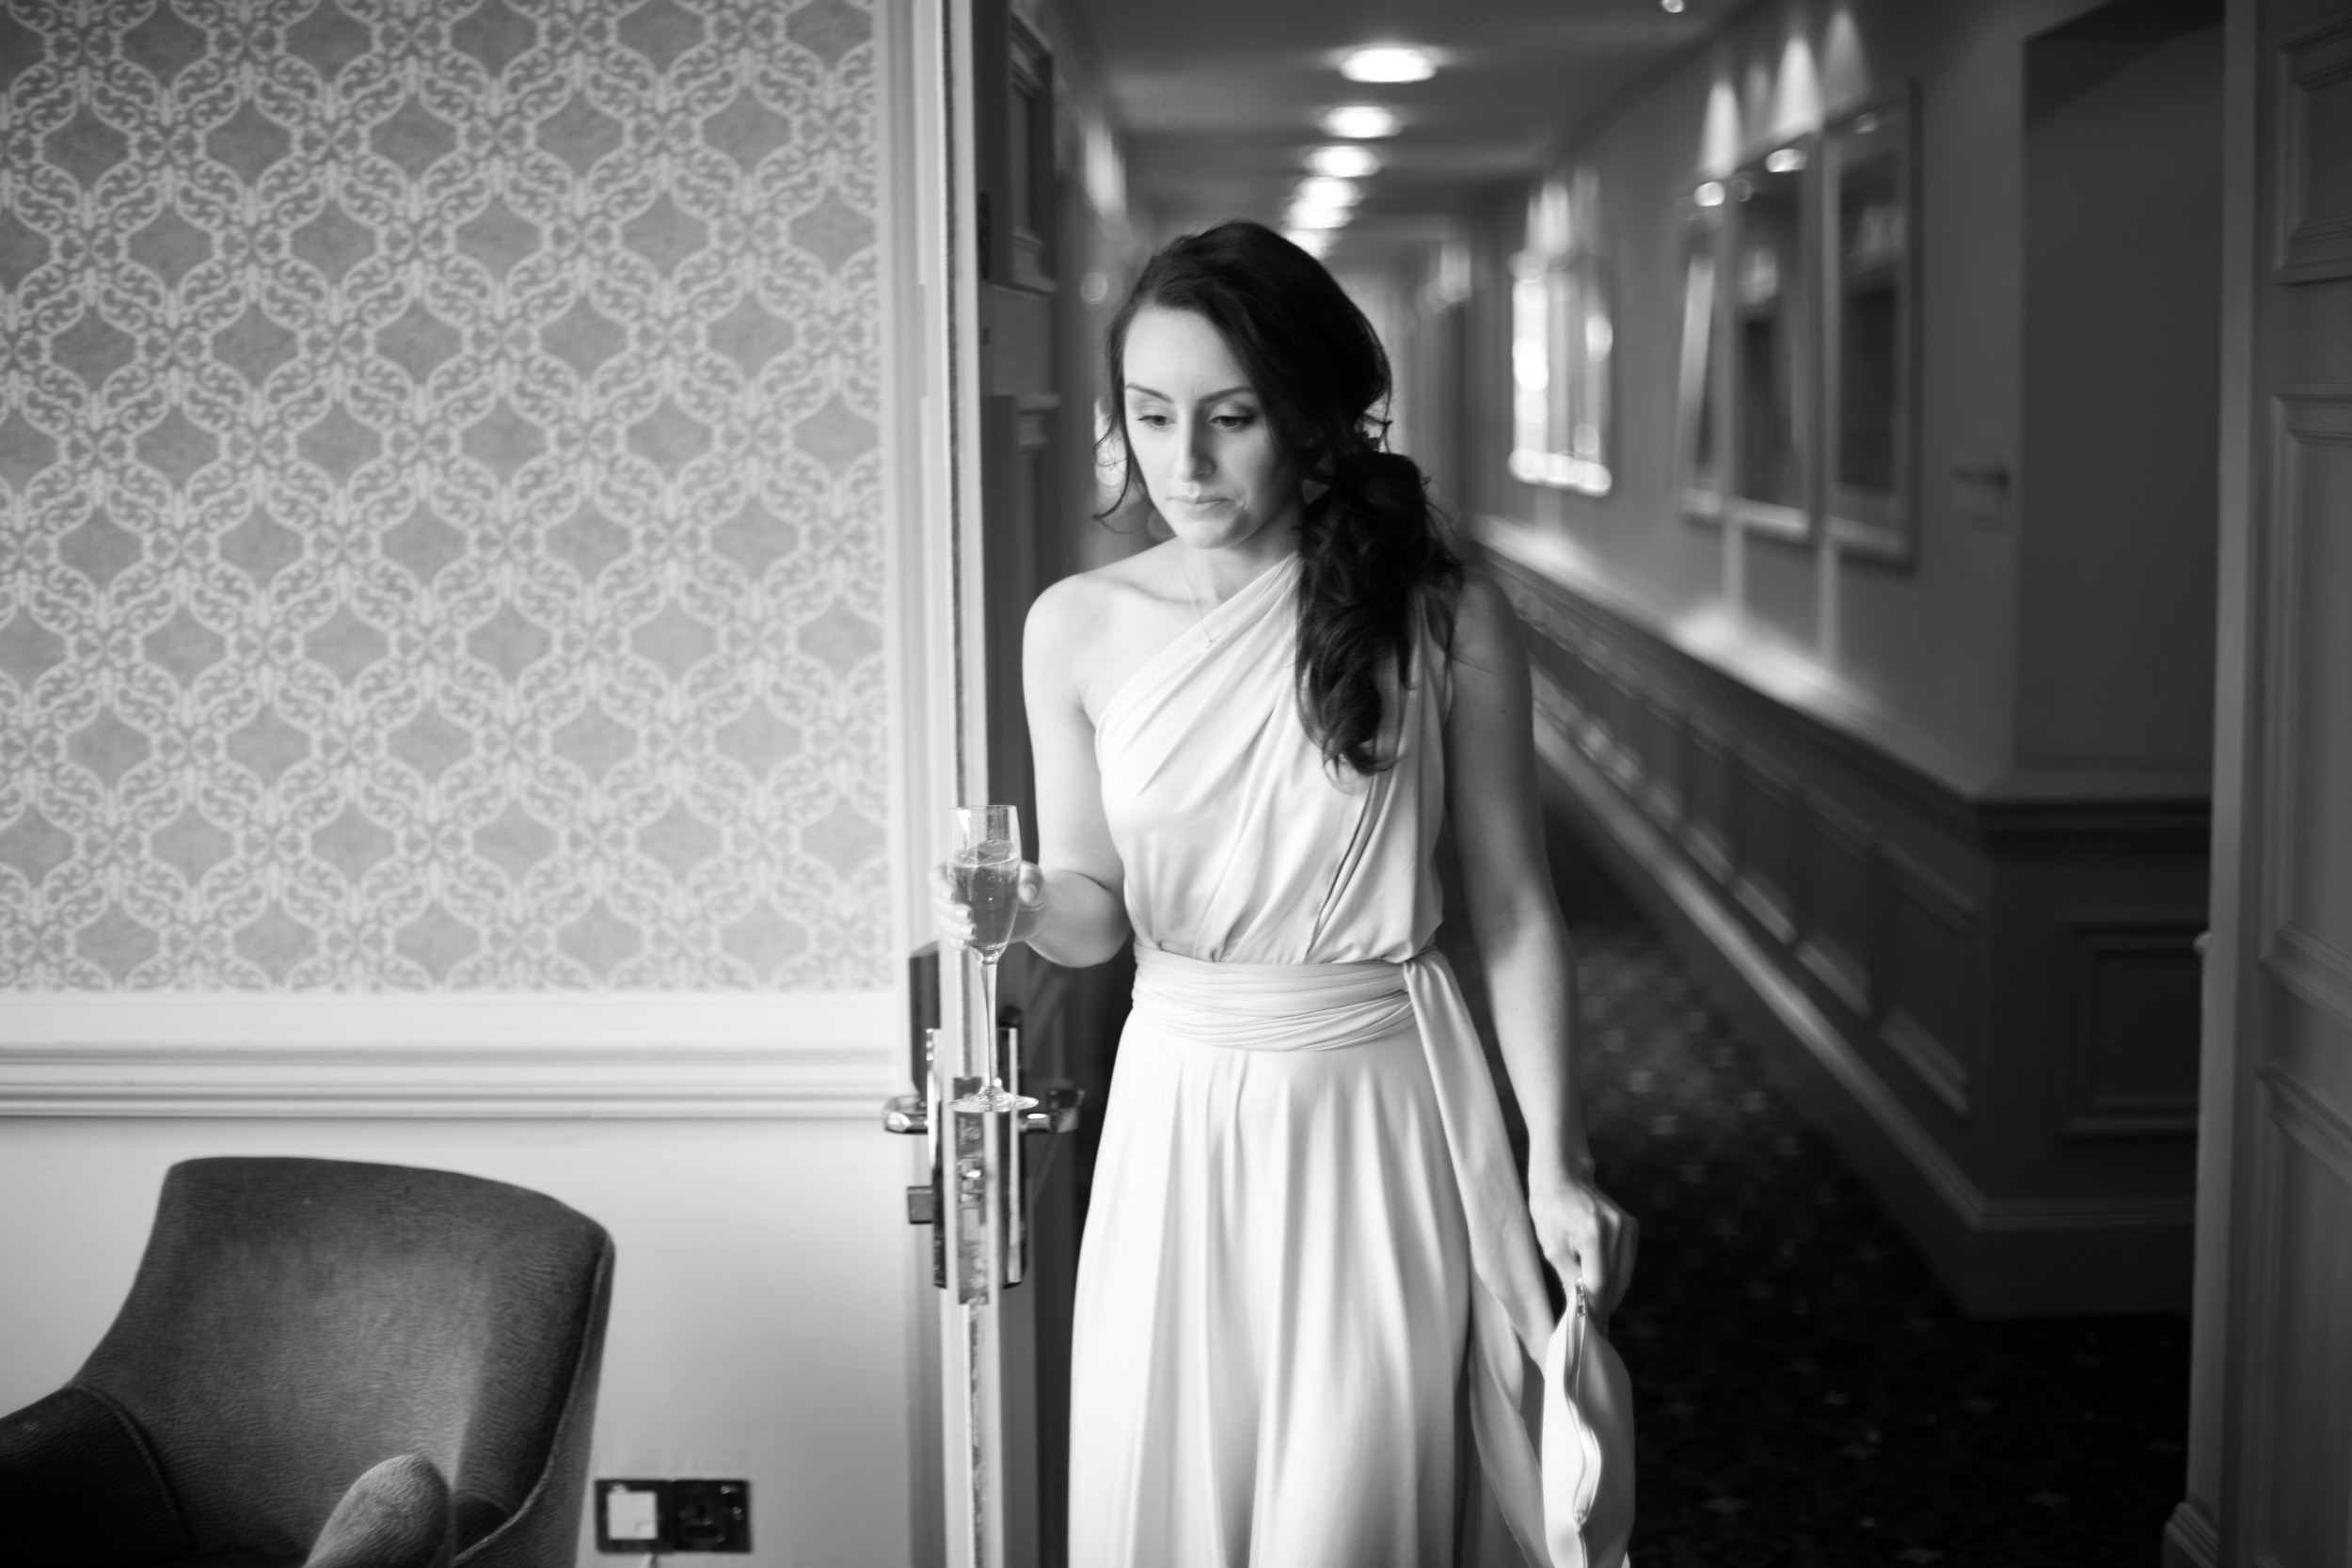 Woodlands-Park-Hotel-Cobham-Surrey-wedding-25